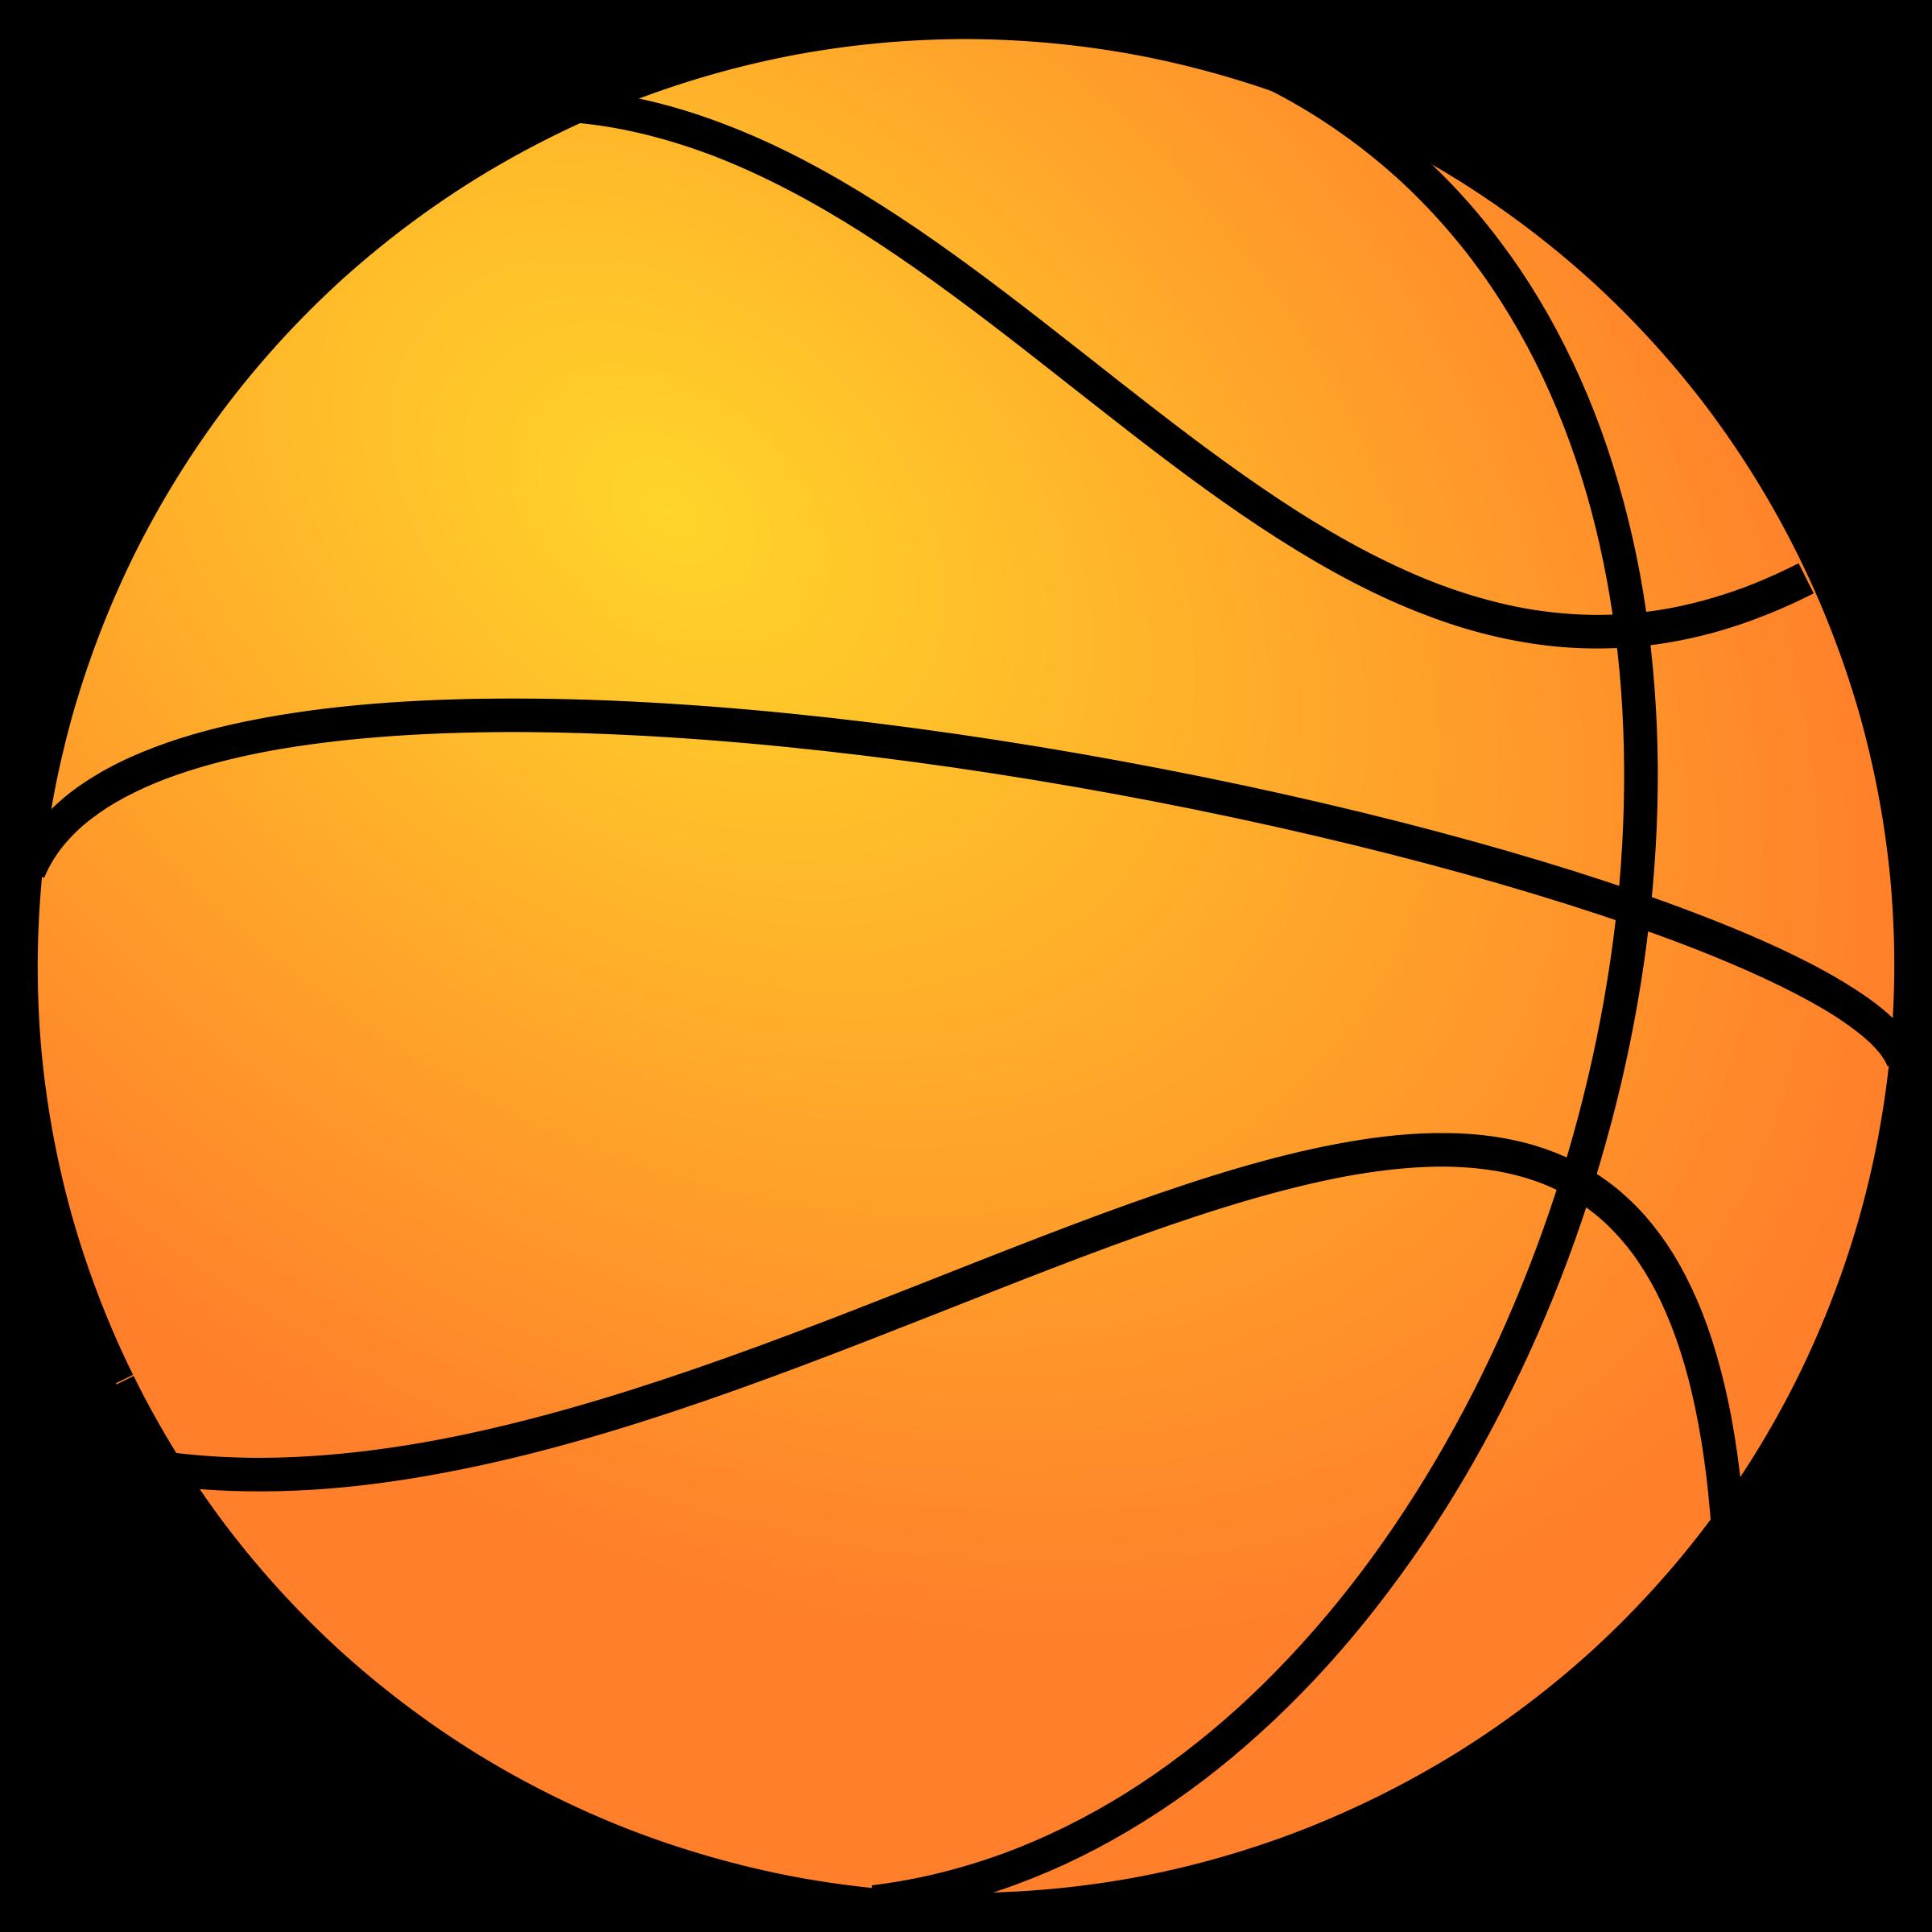 basketball clipart-basketball clipart-0